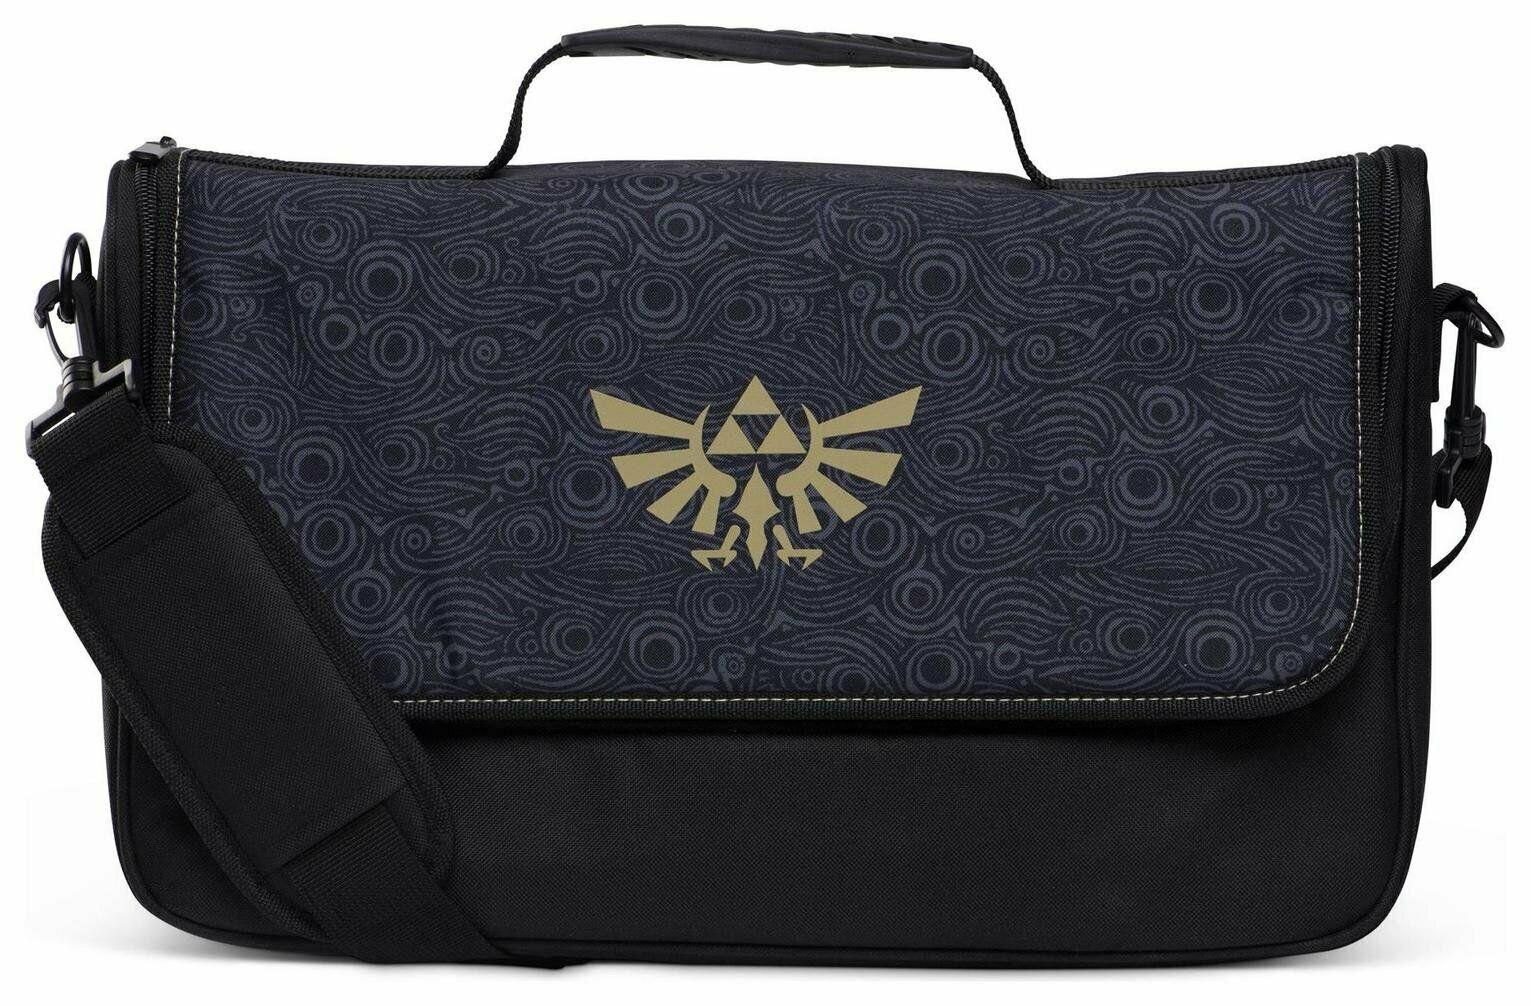 Everywhere Messenger Bag - Nintendo Switch: Legend of Zelda - £9.99 Delivered @ Argos via eBay